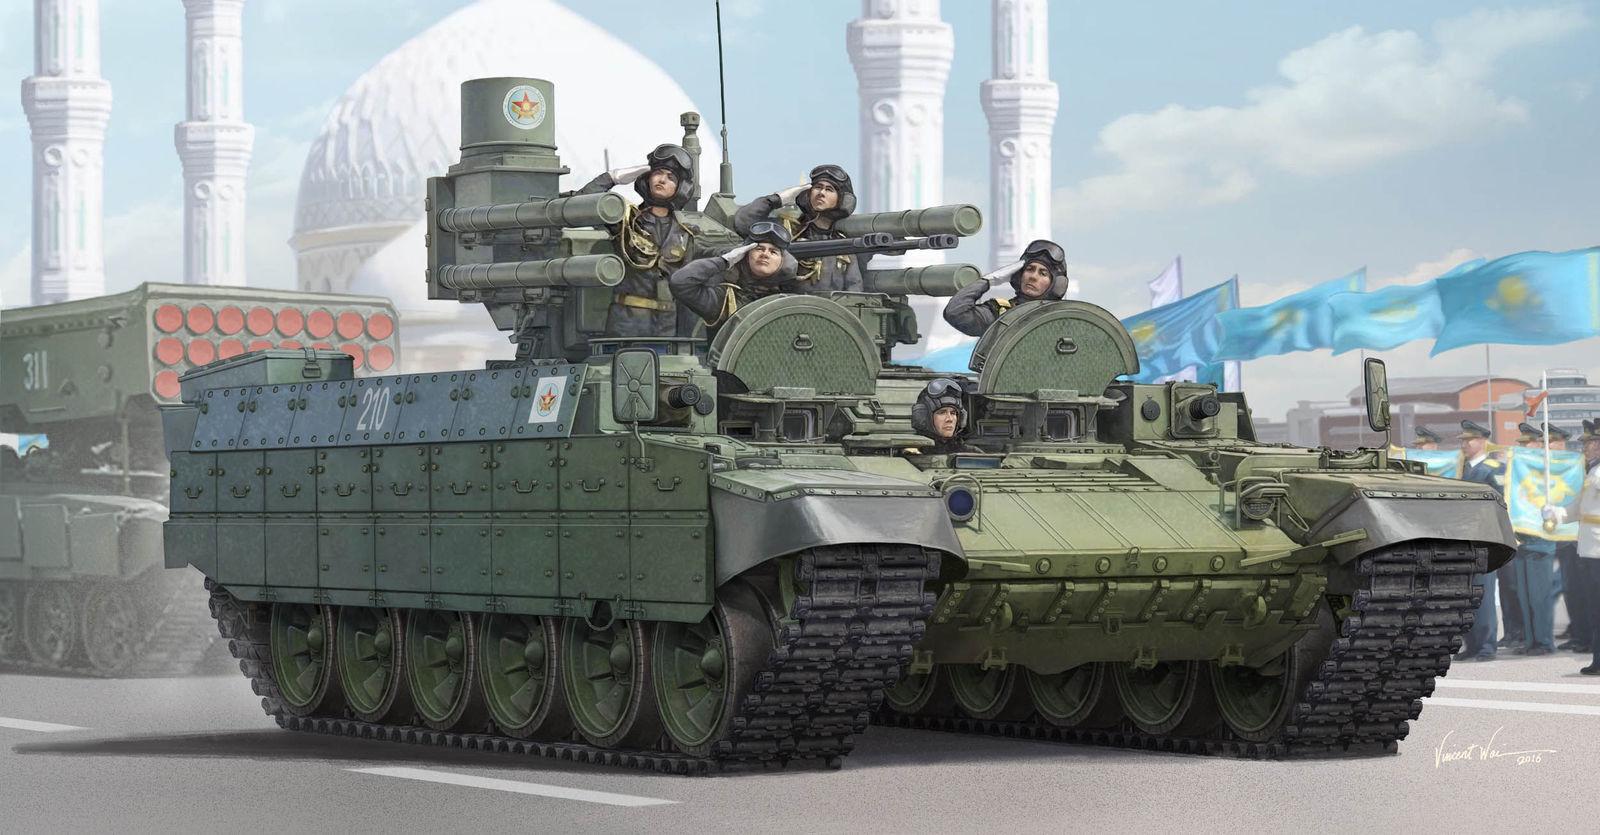 Trumpeter Bmpt Kazakhstan Army Russkoe Army 1 3 5 1 3 5 Building Kit Kit 09506